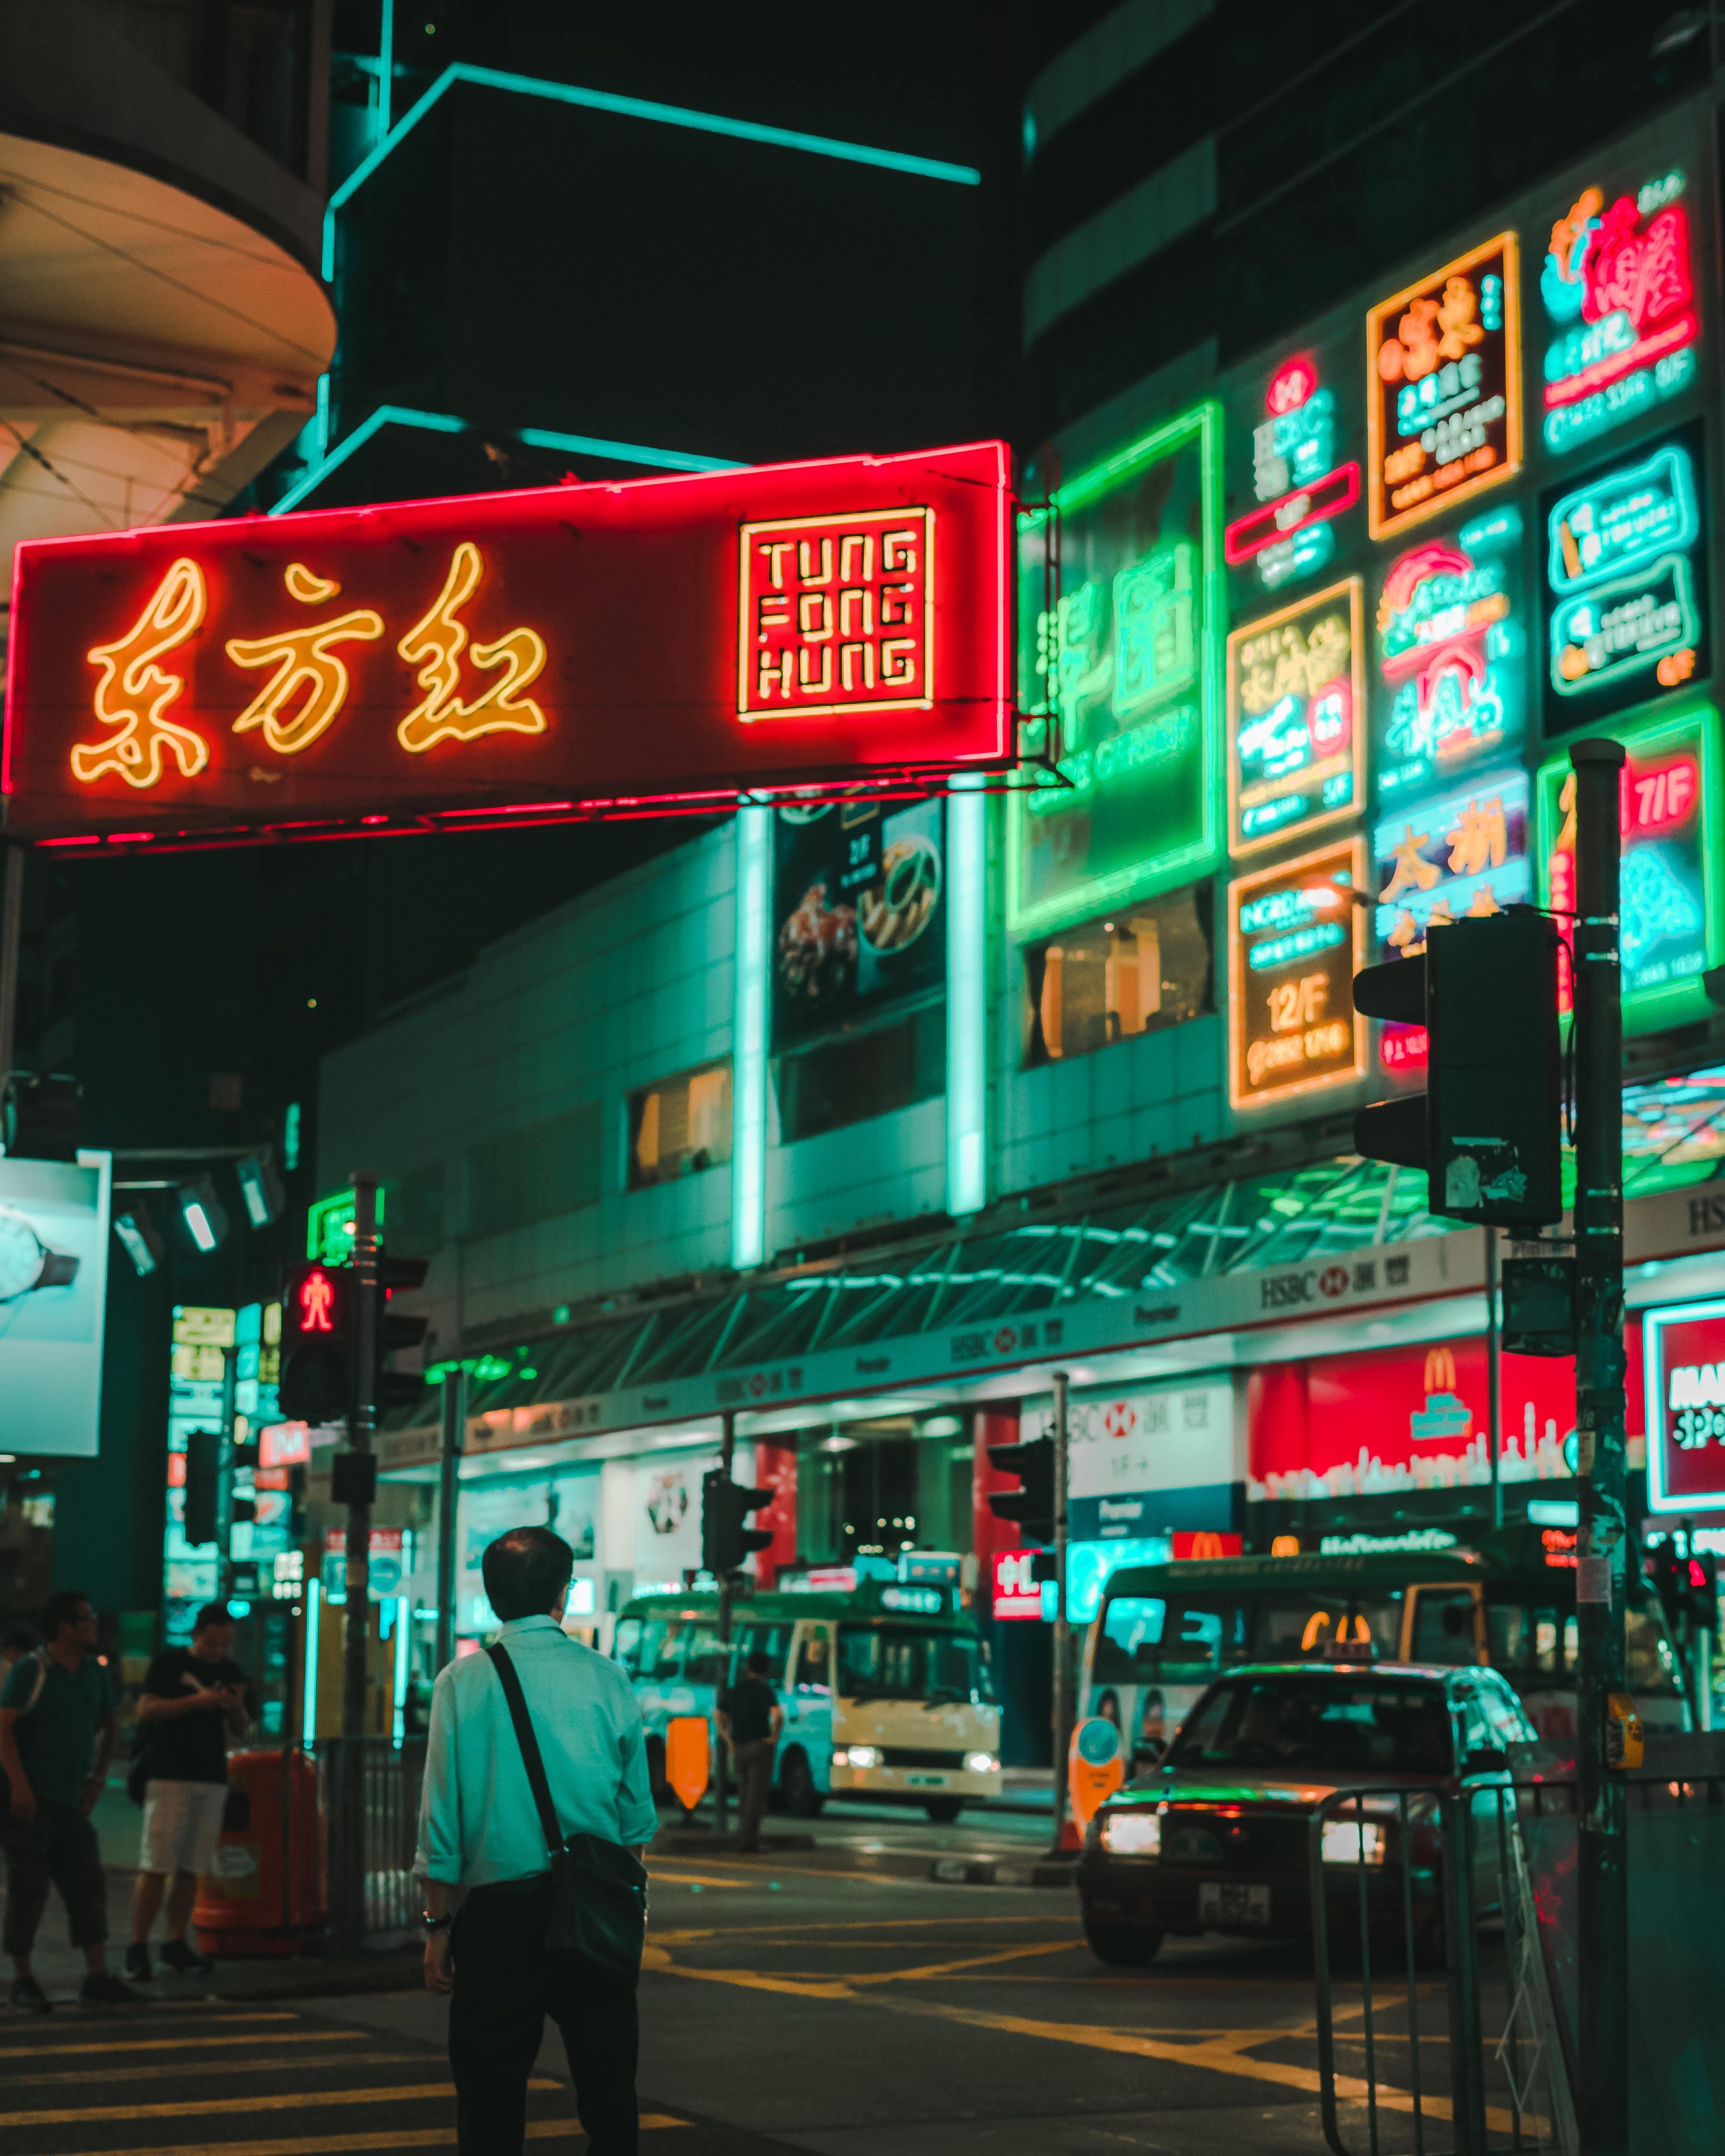 man walking on street under tung fong hung signage